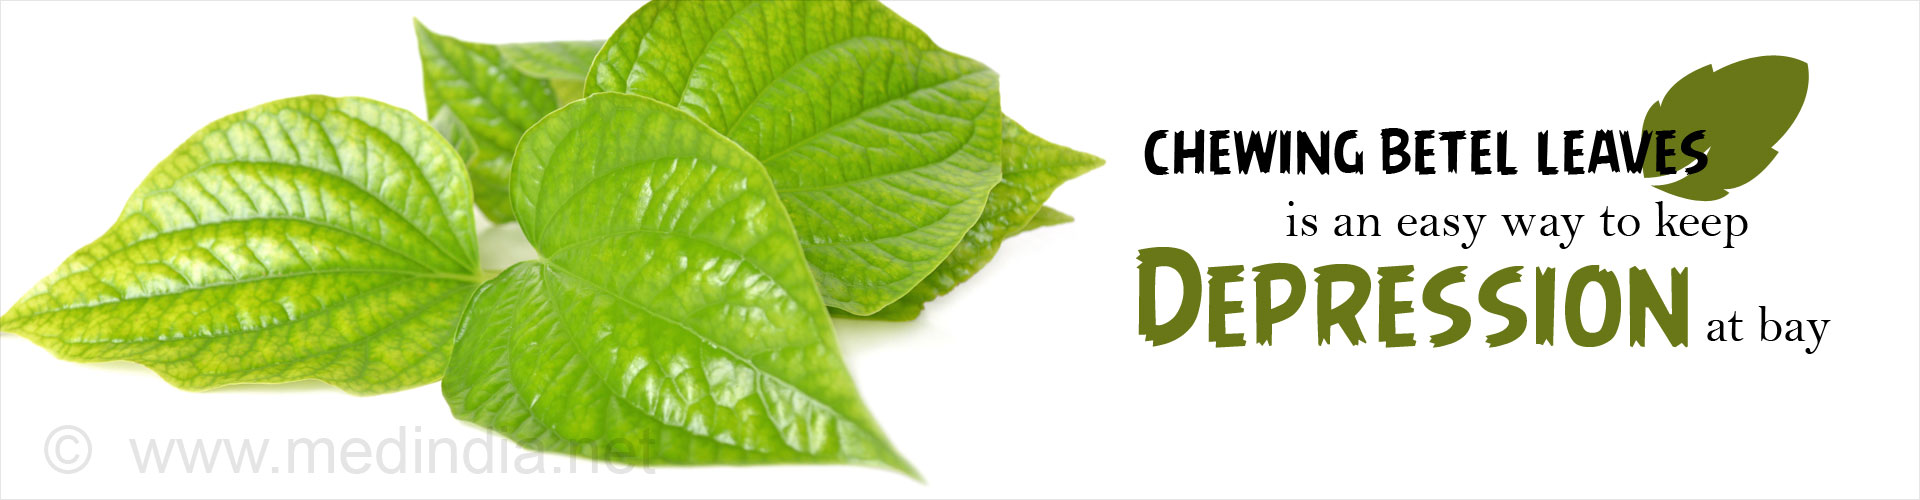 Top 10 Medicinal Benefits of Betel Leaves